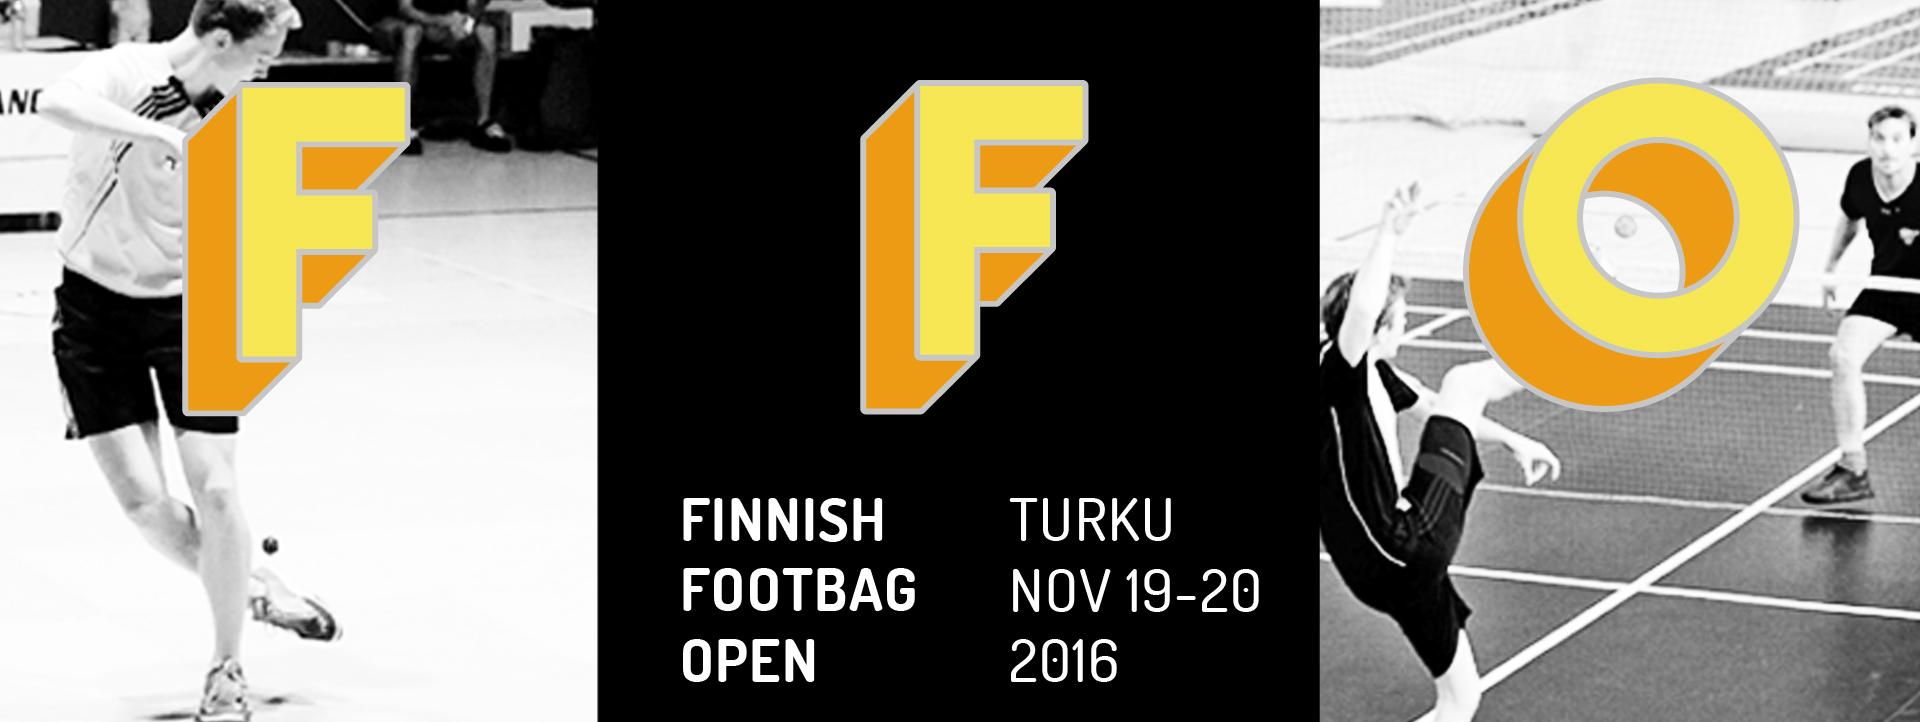 Finnish Footbag Open 2016